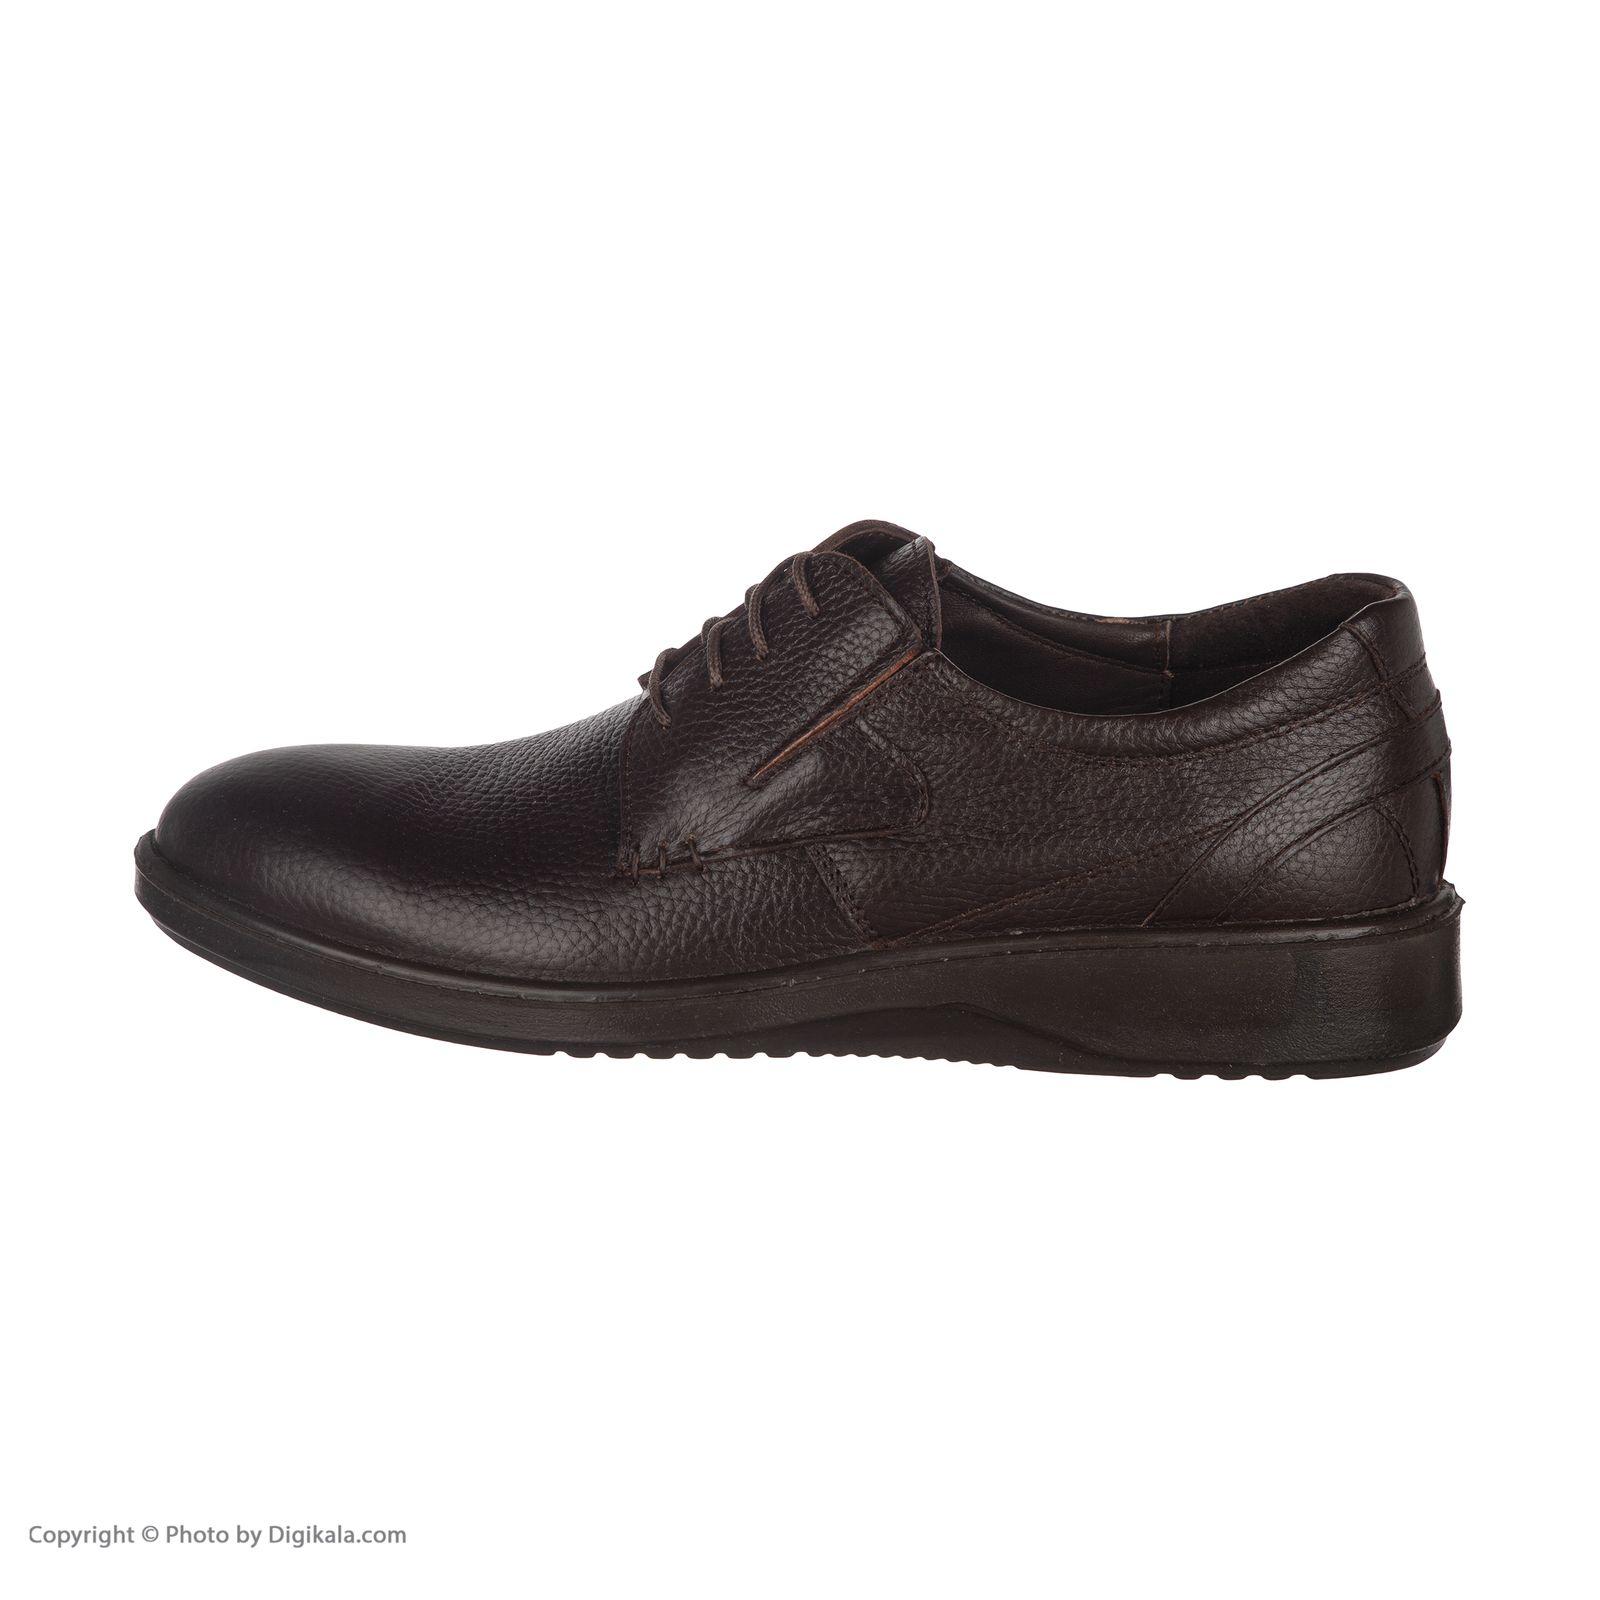 کفش روزمره مردانه آذر پلاس مدل 9438B503104 -  - 3